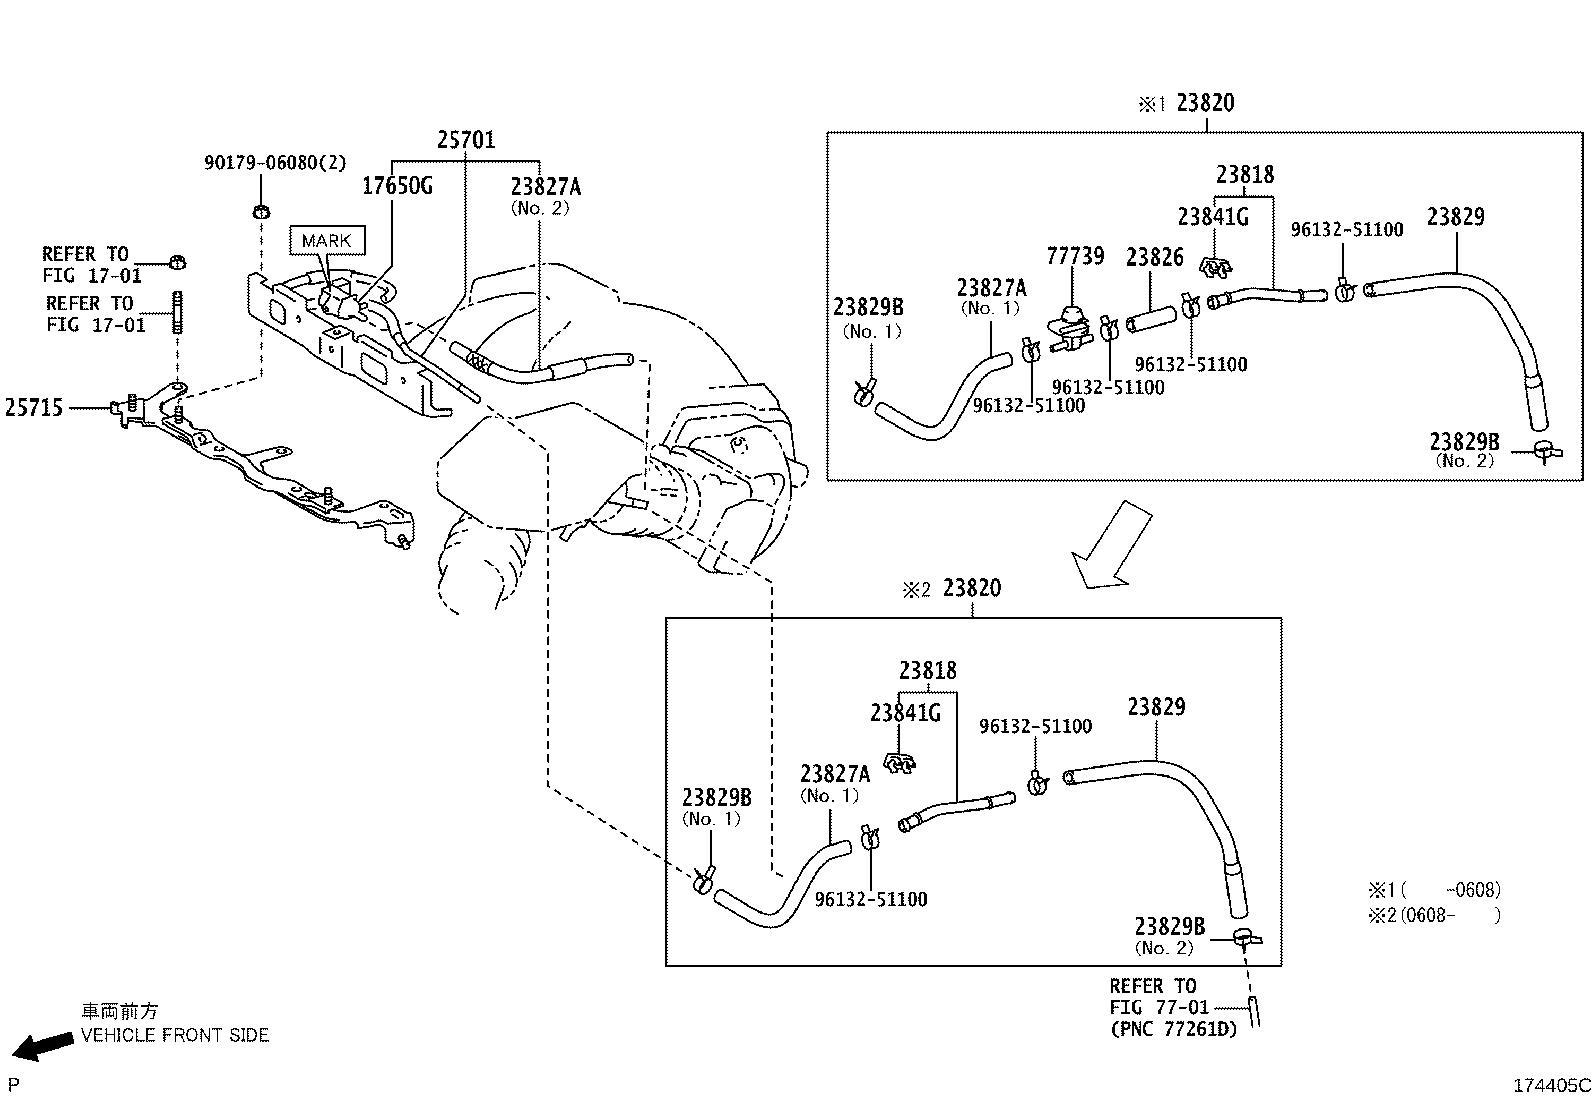 Lexus RX 400h Vapor Canister Purge Solenoid. Valve